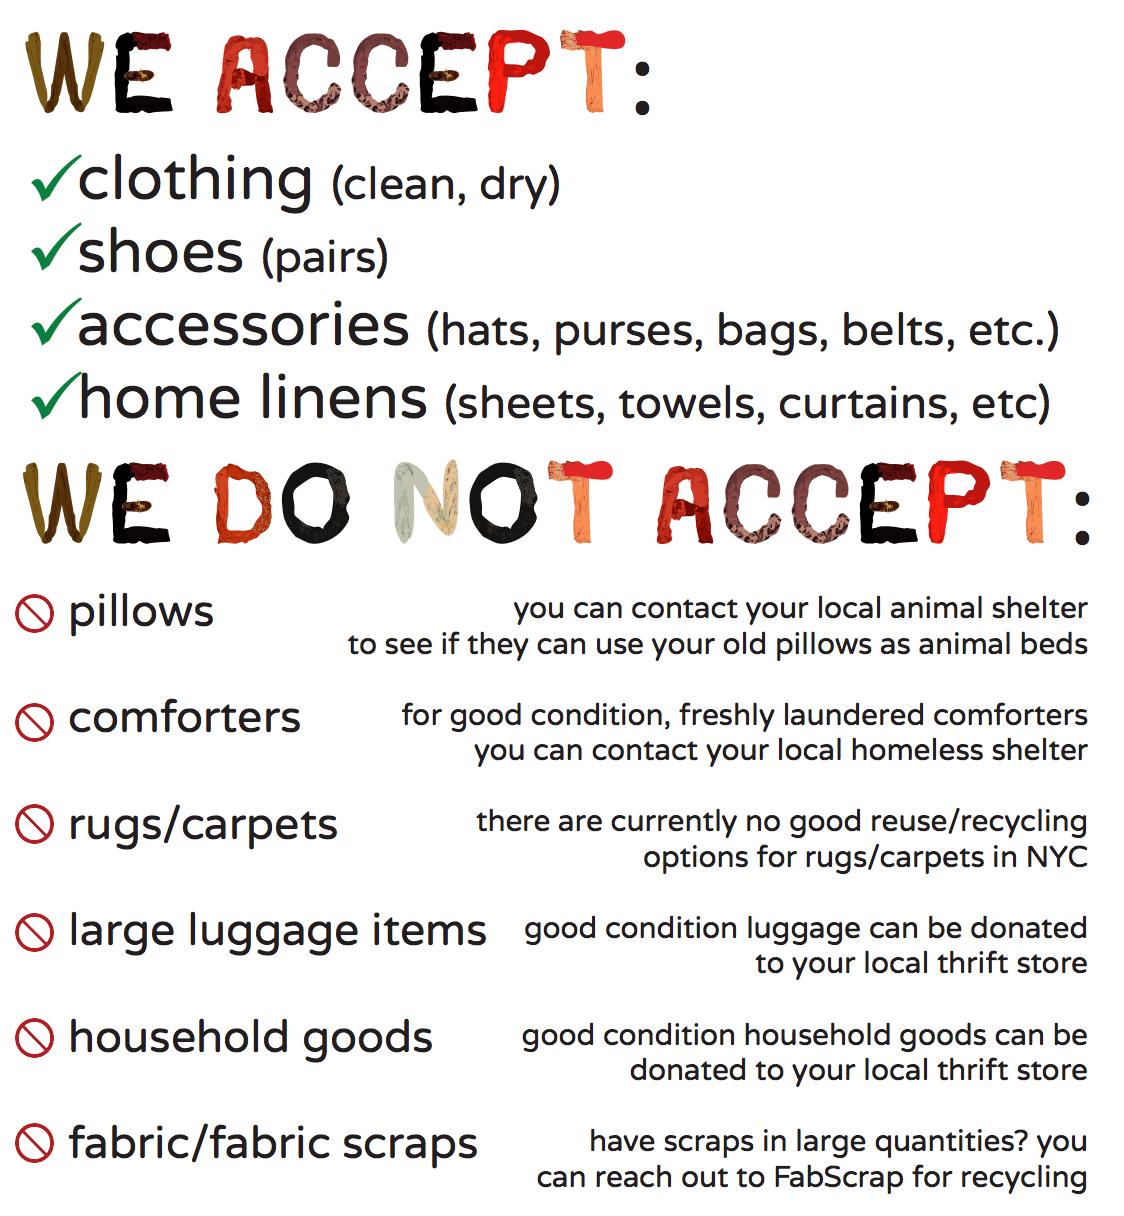 we accept - we do not accept